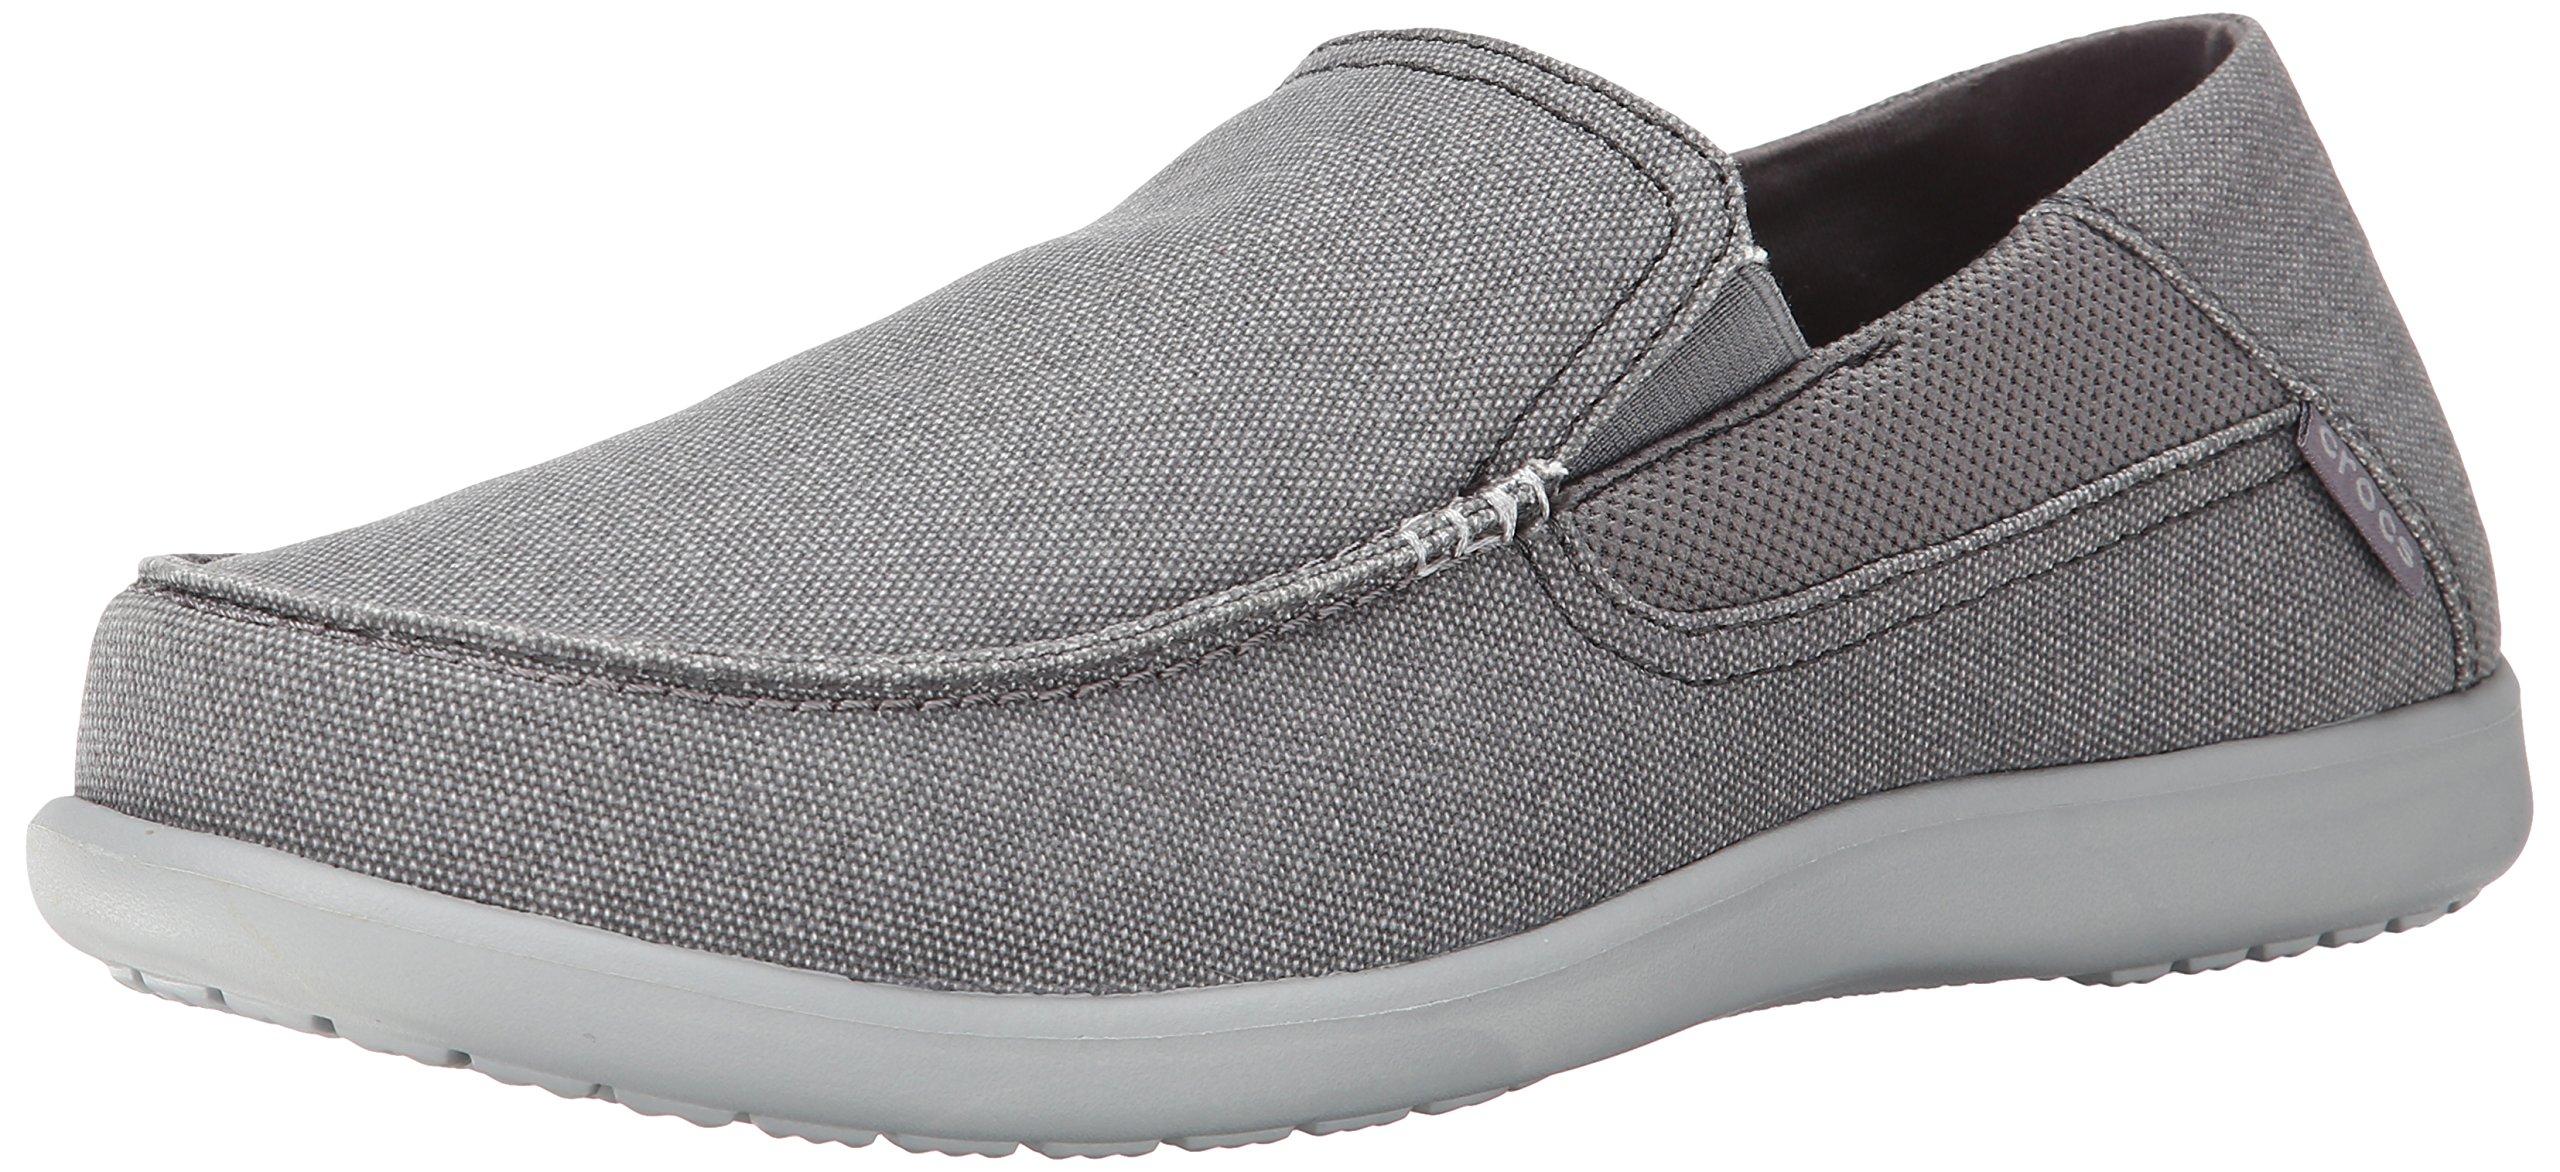 Crocs Men's Santa Cruz 2 Luxe M Slip-On Loafer, Charcoal/Light Grey, 13 D(M) US